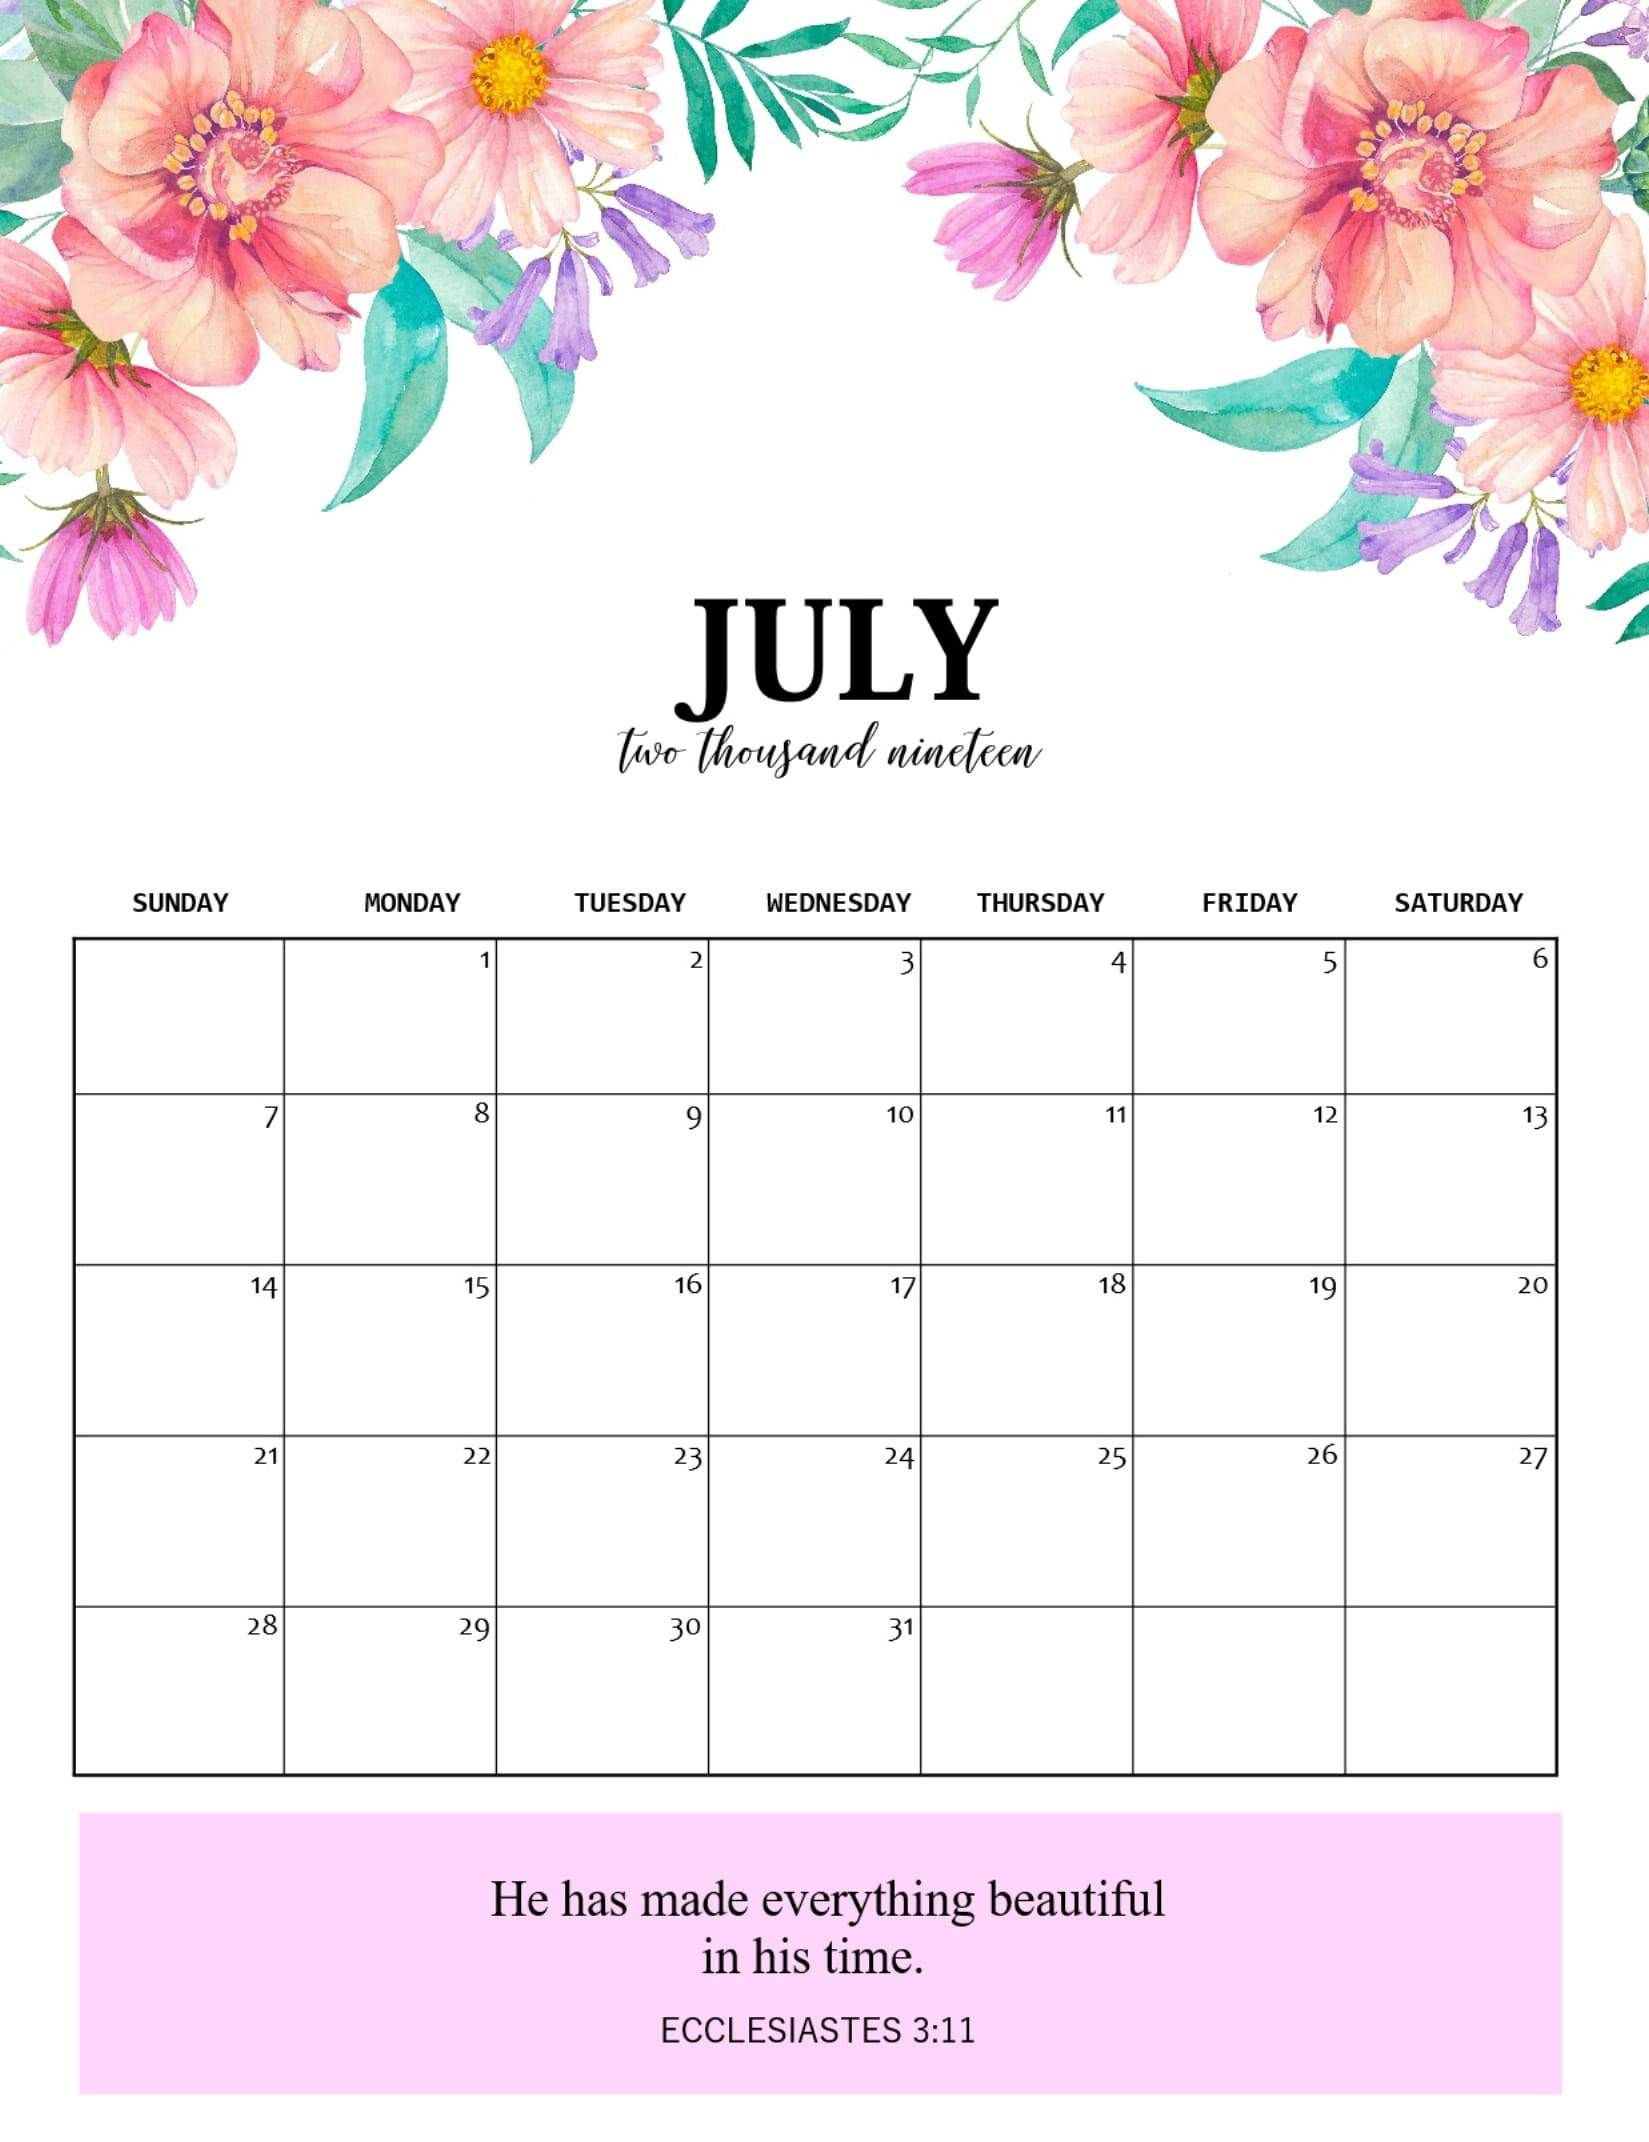 July Public Holidays 2019 Calendar Global Holidays Holiday